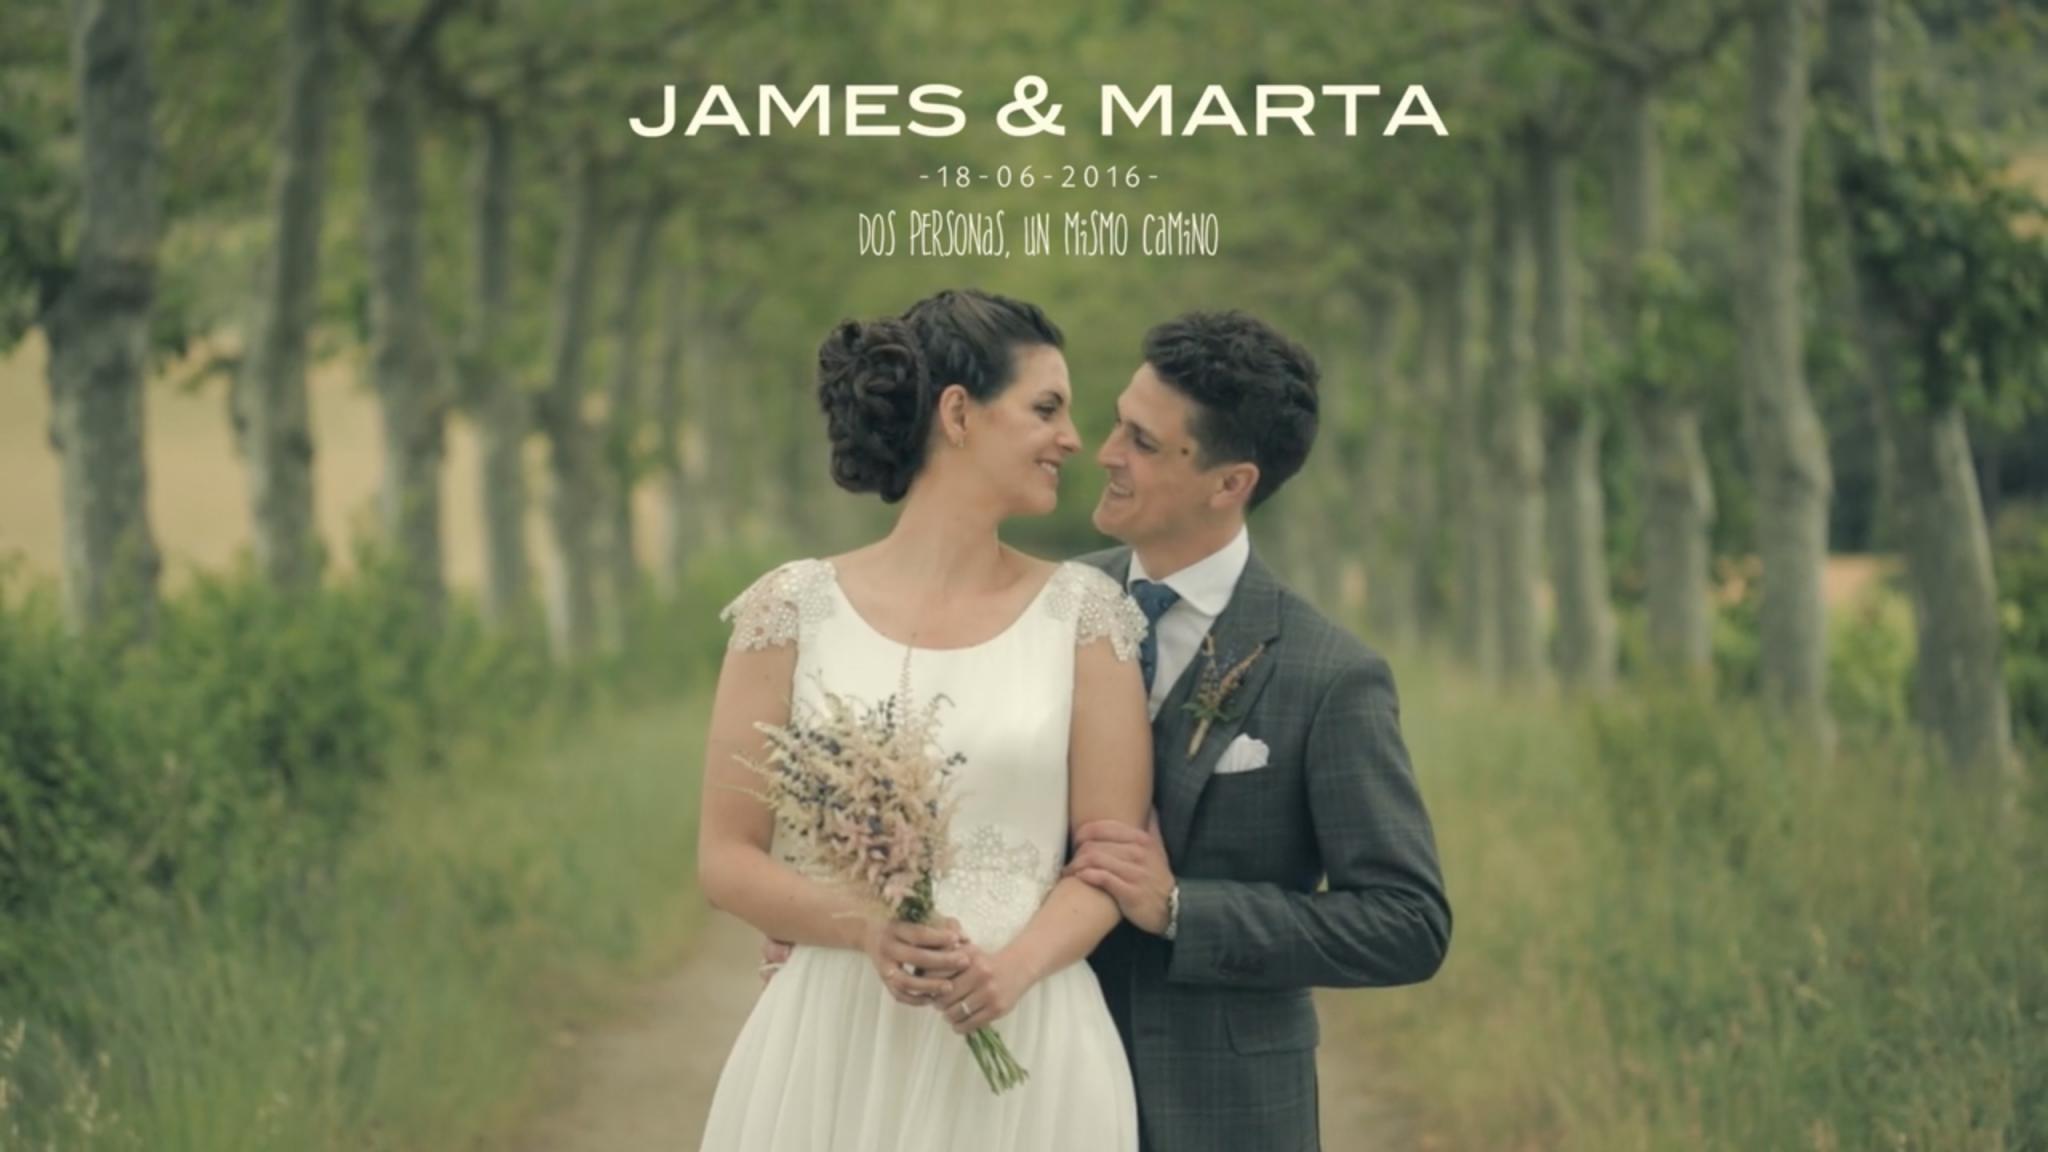 James & Marta